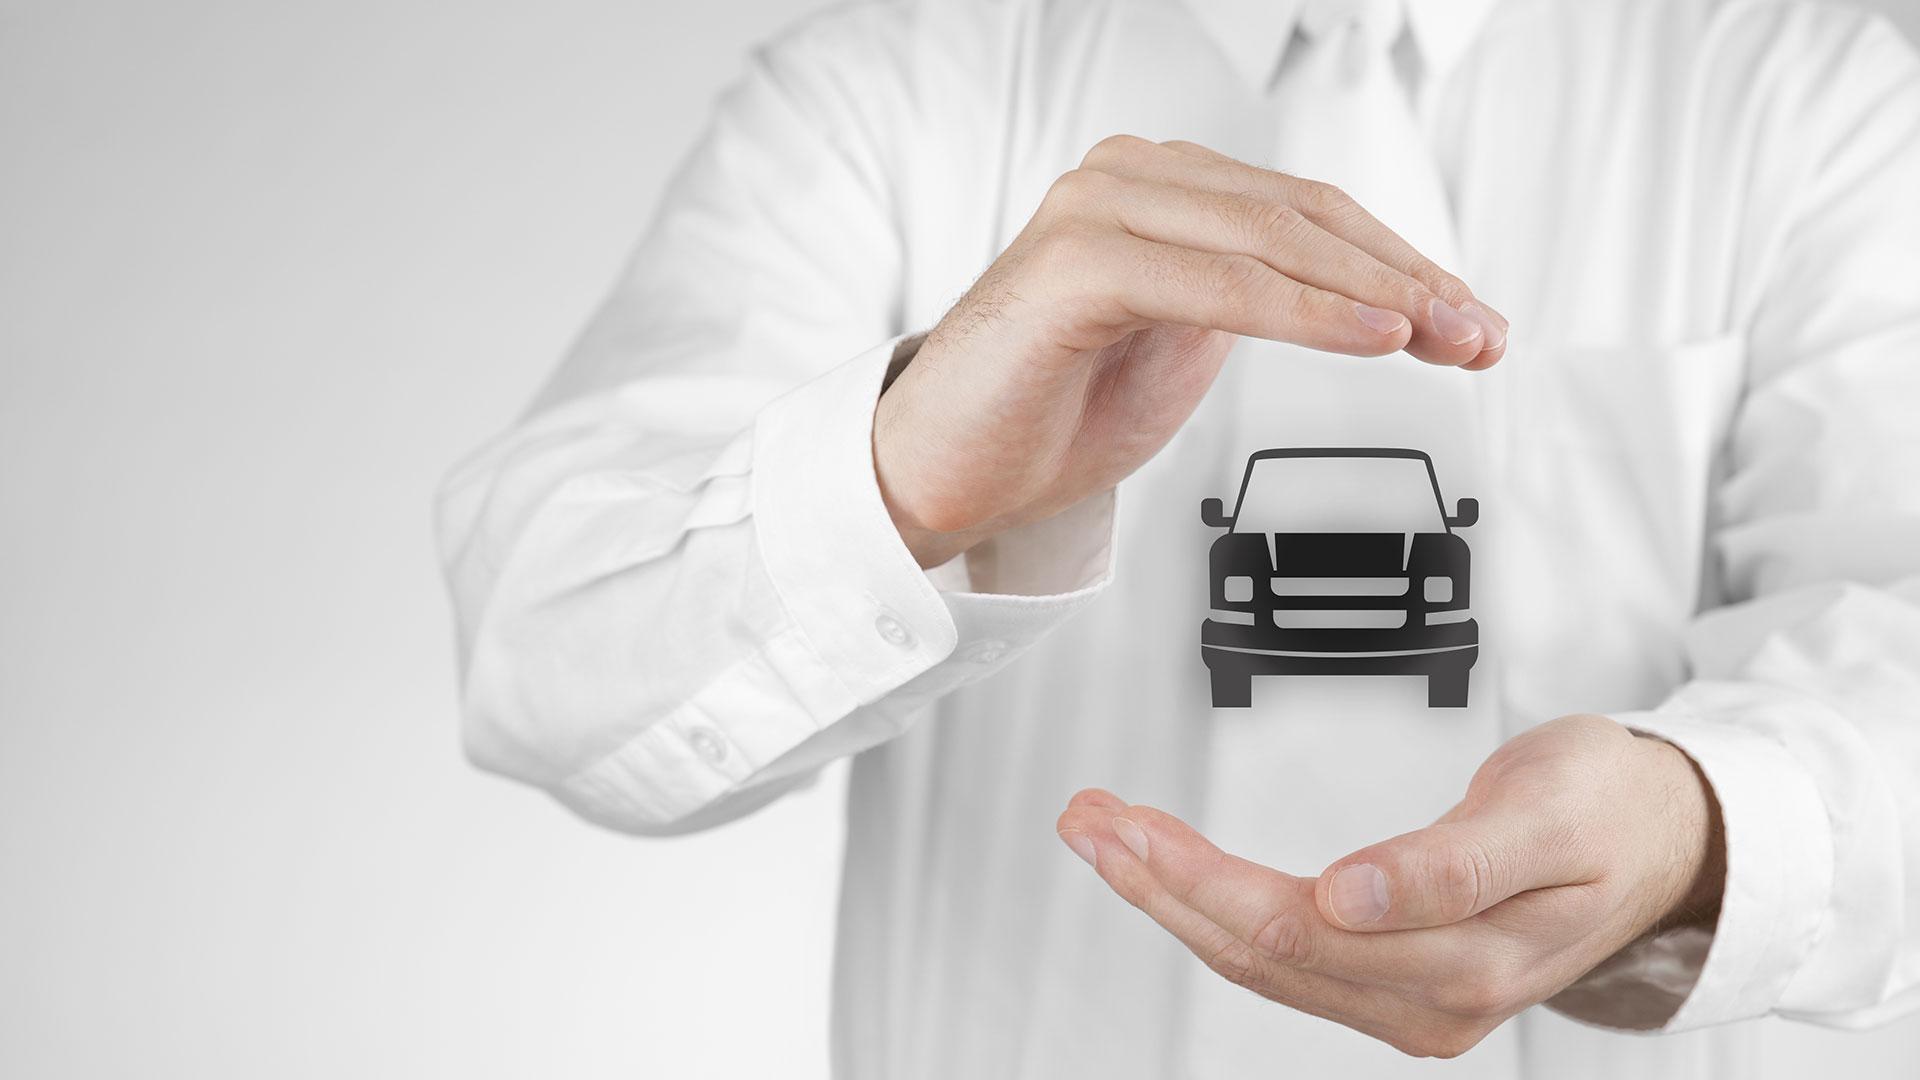 Insurance leuven (verzekeringleuven) has the best solutions for you